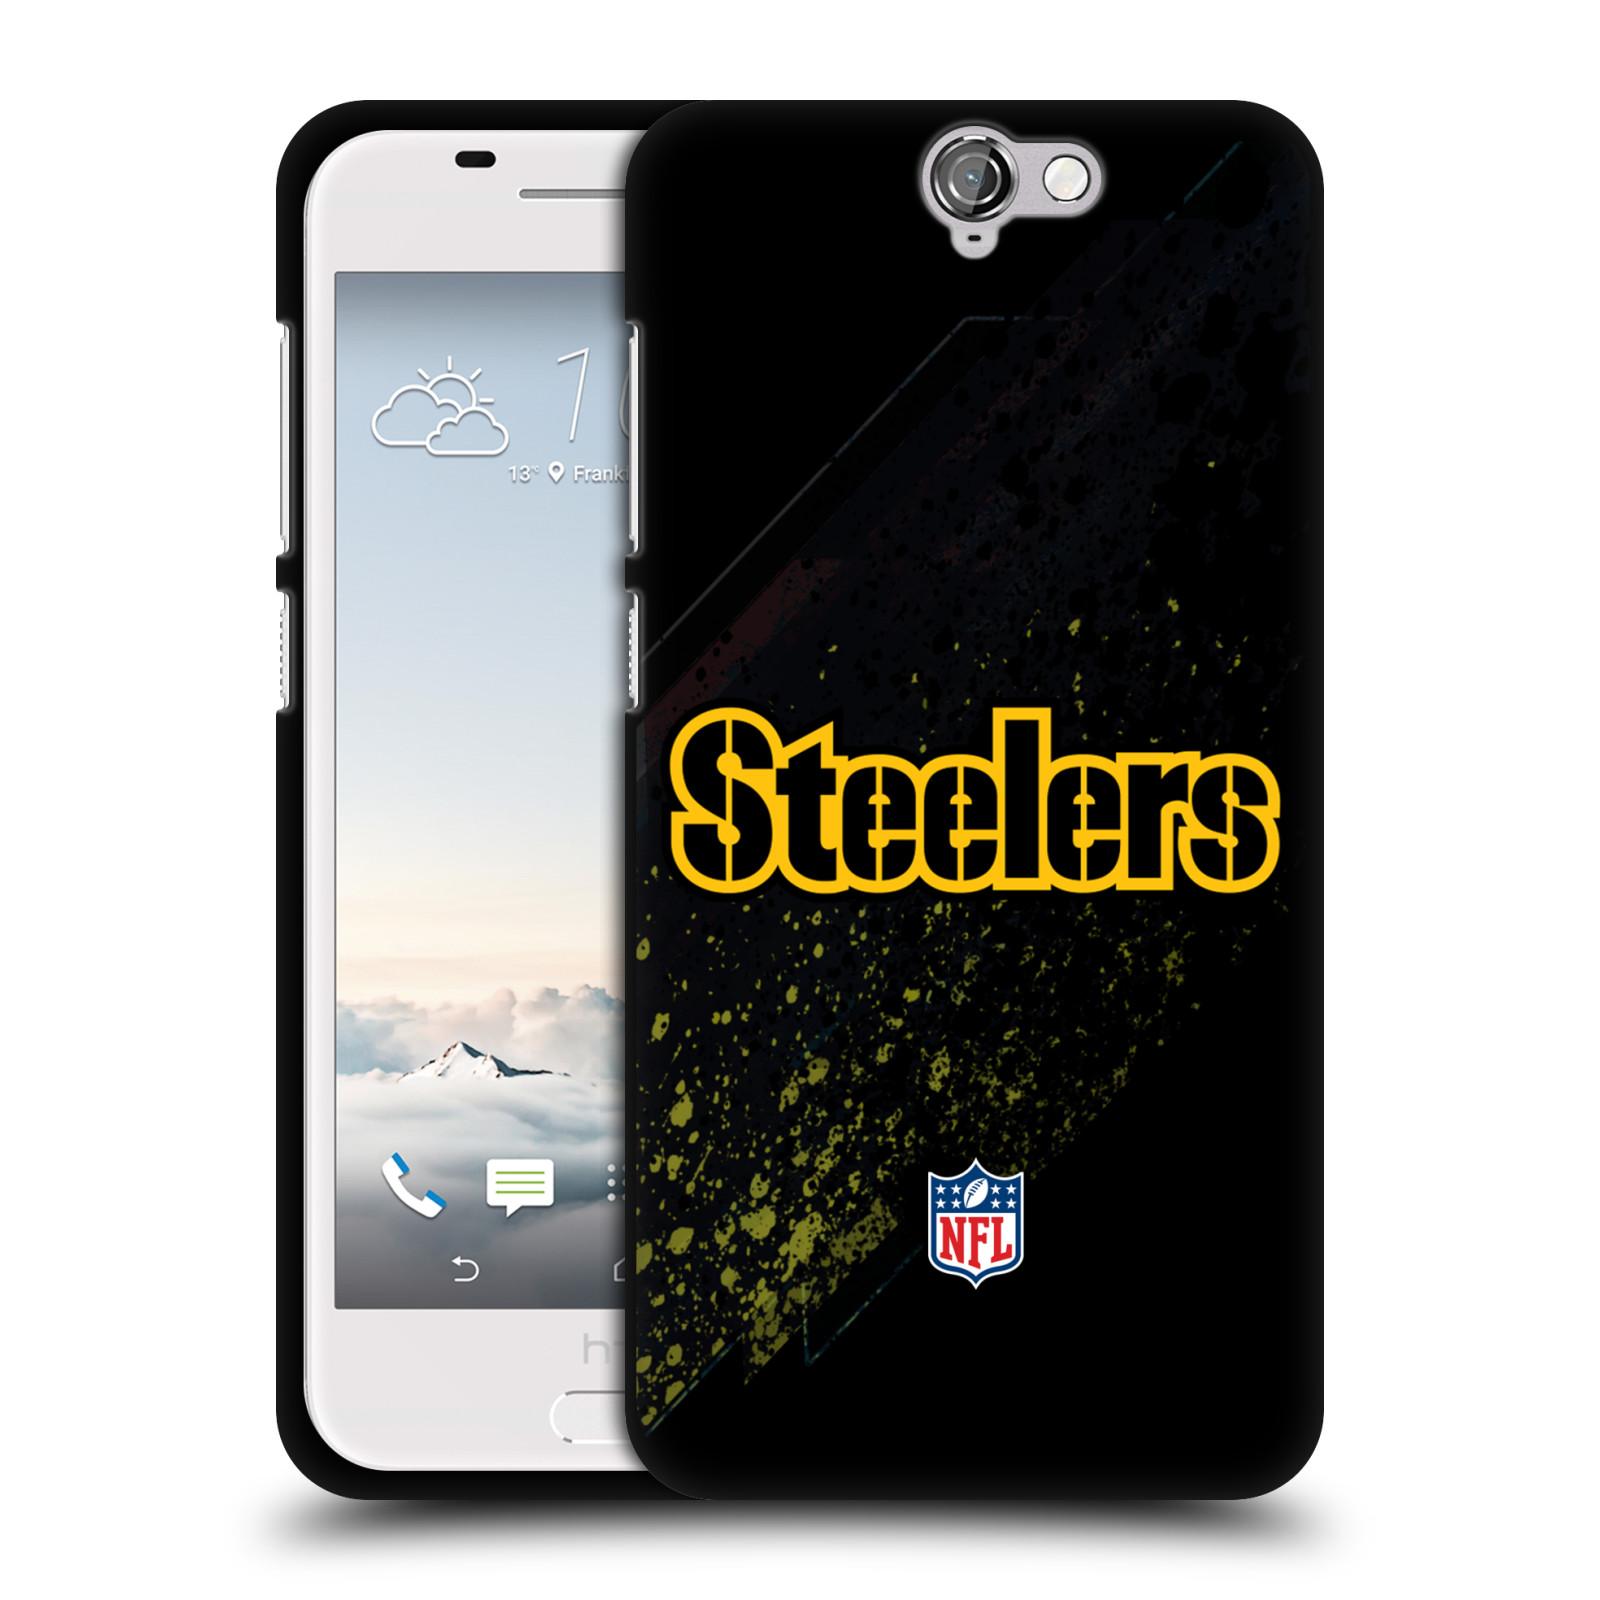 OFFICIAL-NFL-PITTSBURGH-STEELERS-LOGO-BLACK-SOFT-GEL-CASE-FOR-HTC-PHONES